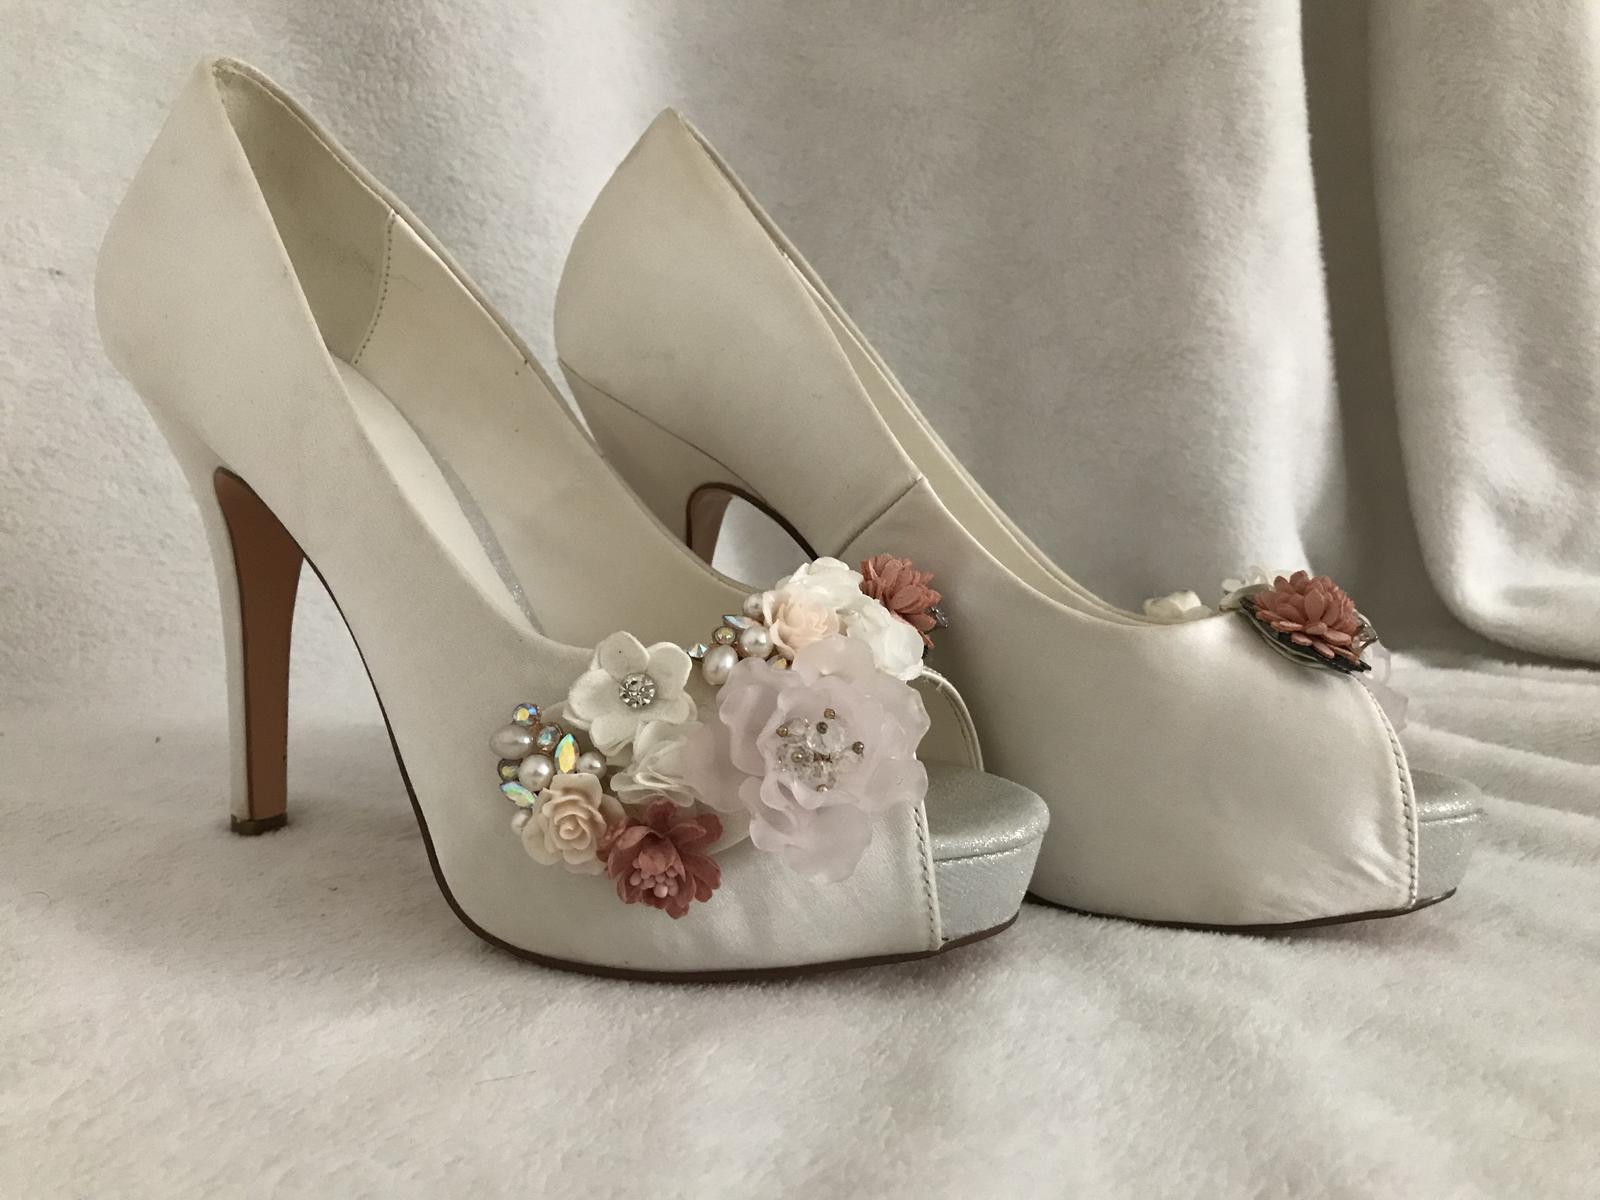 Svadobné topánky Menbur - Obrázok č. 1